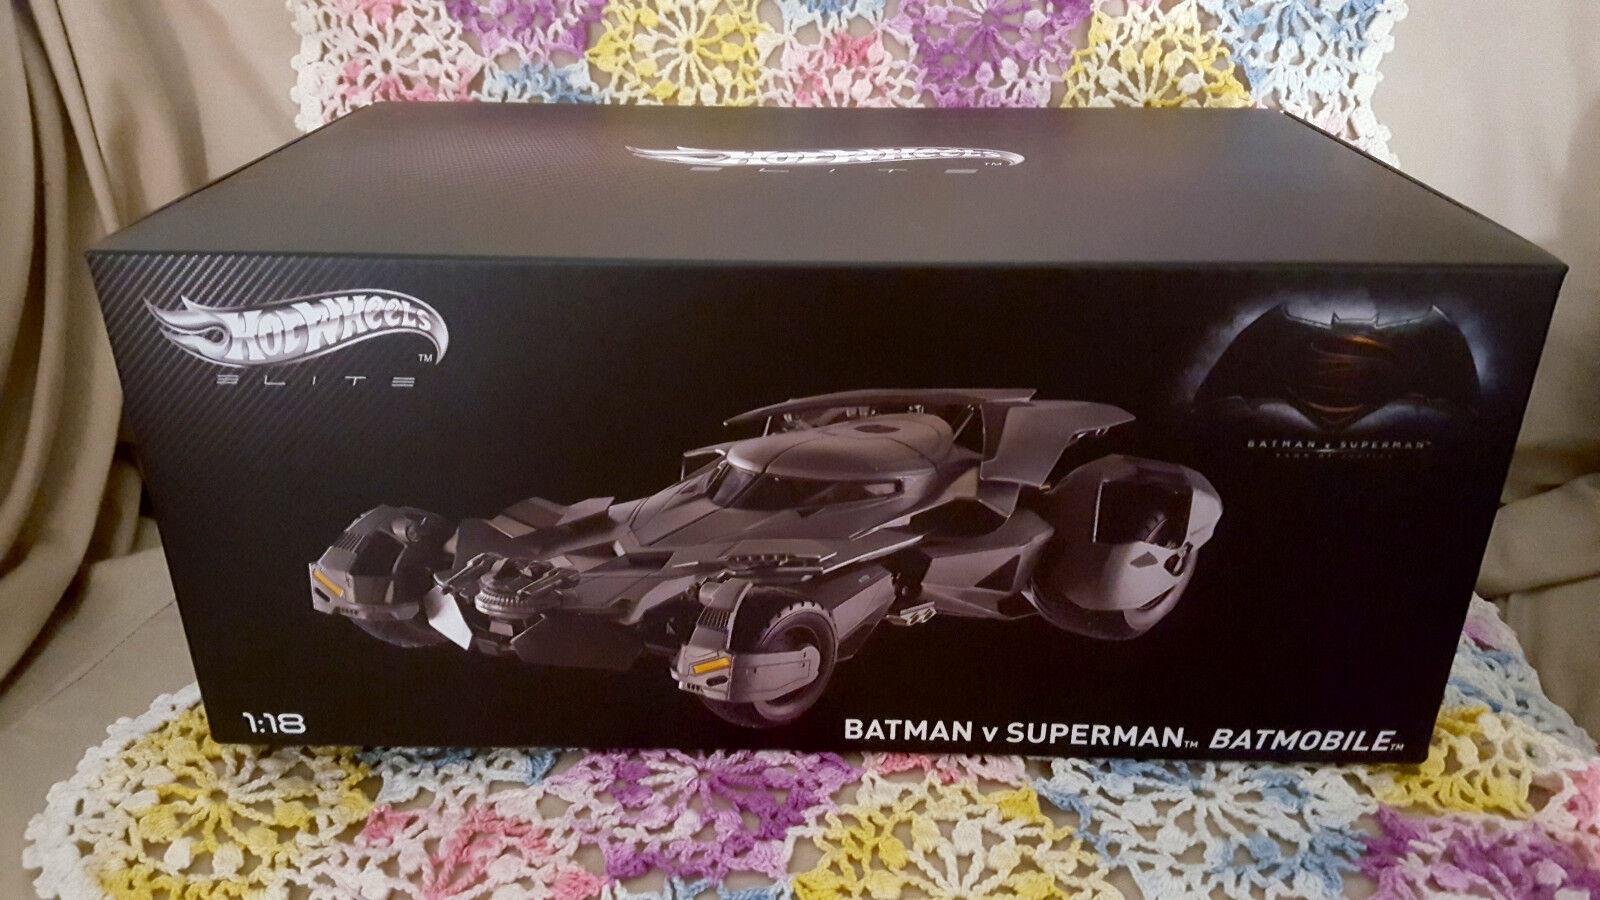 Batman v Superman Batmobile 1 18 Scale Hot Wheels Elite Die-Cast Vehicle - NEW